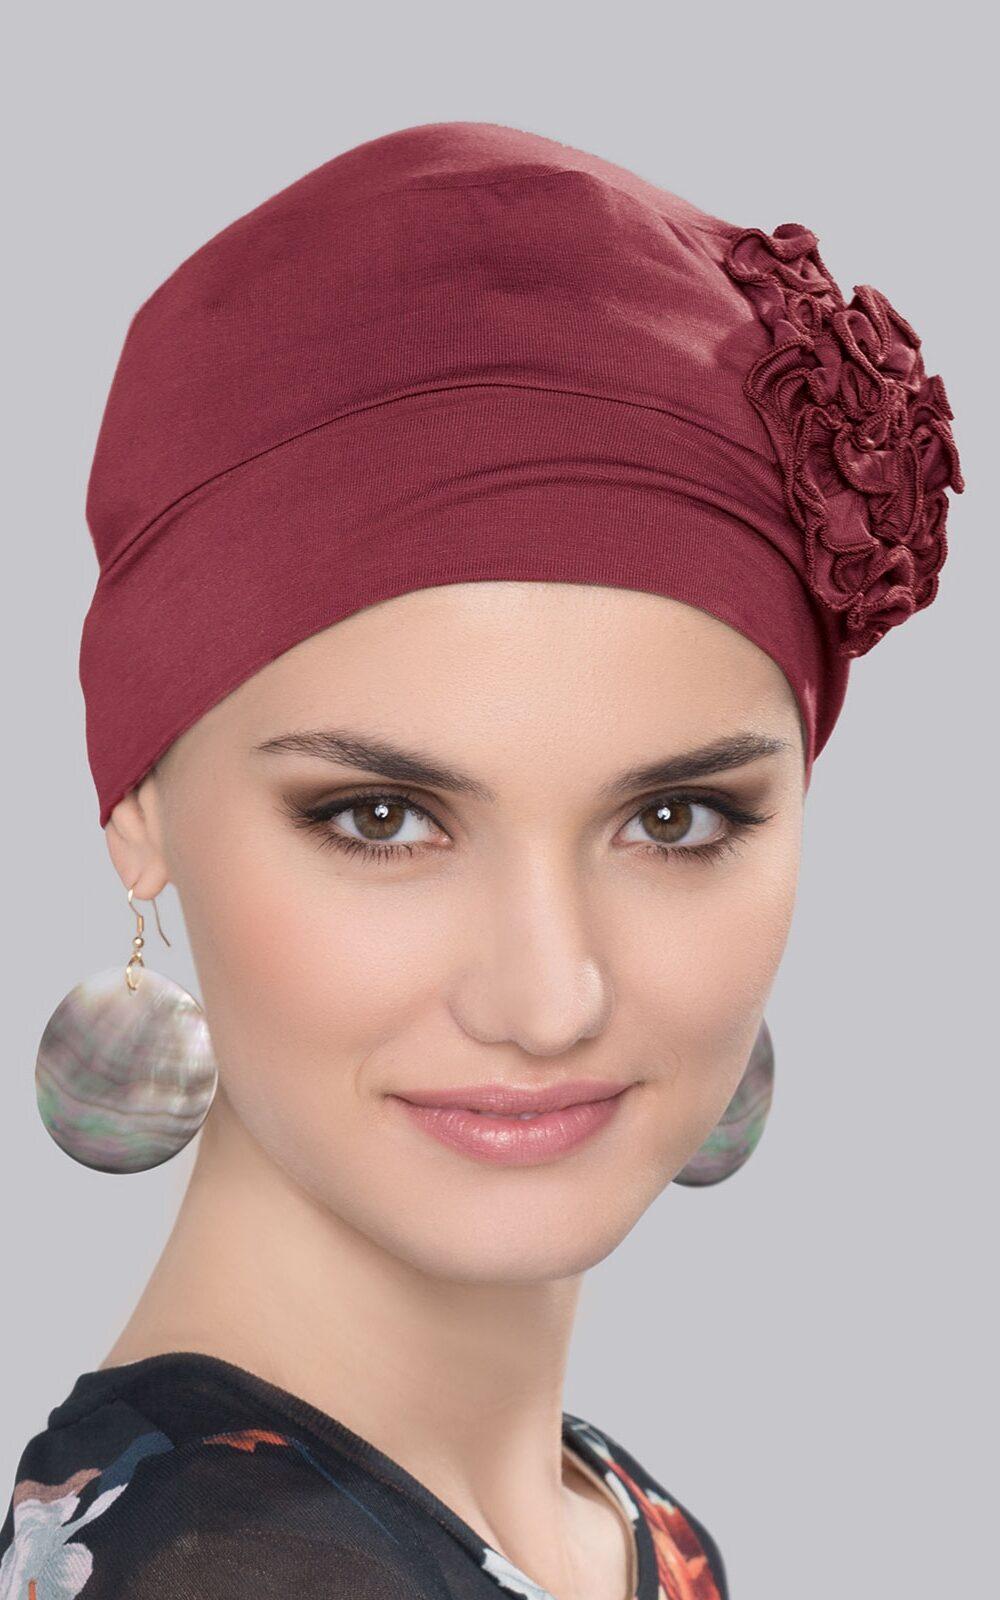 Lyra | Turban For Cancer | Ellen Wille Headwear - Wigs | Elly-k